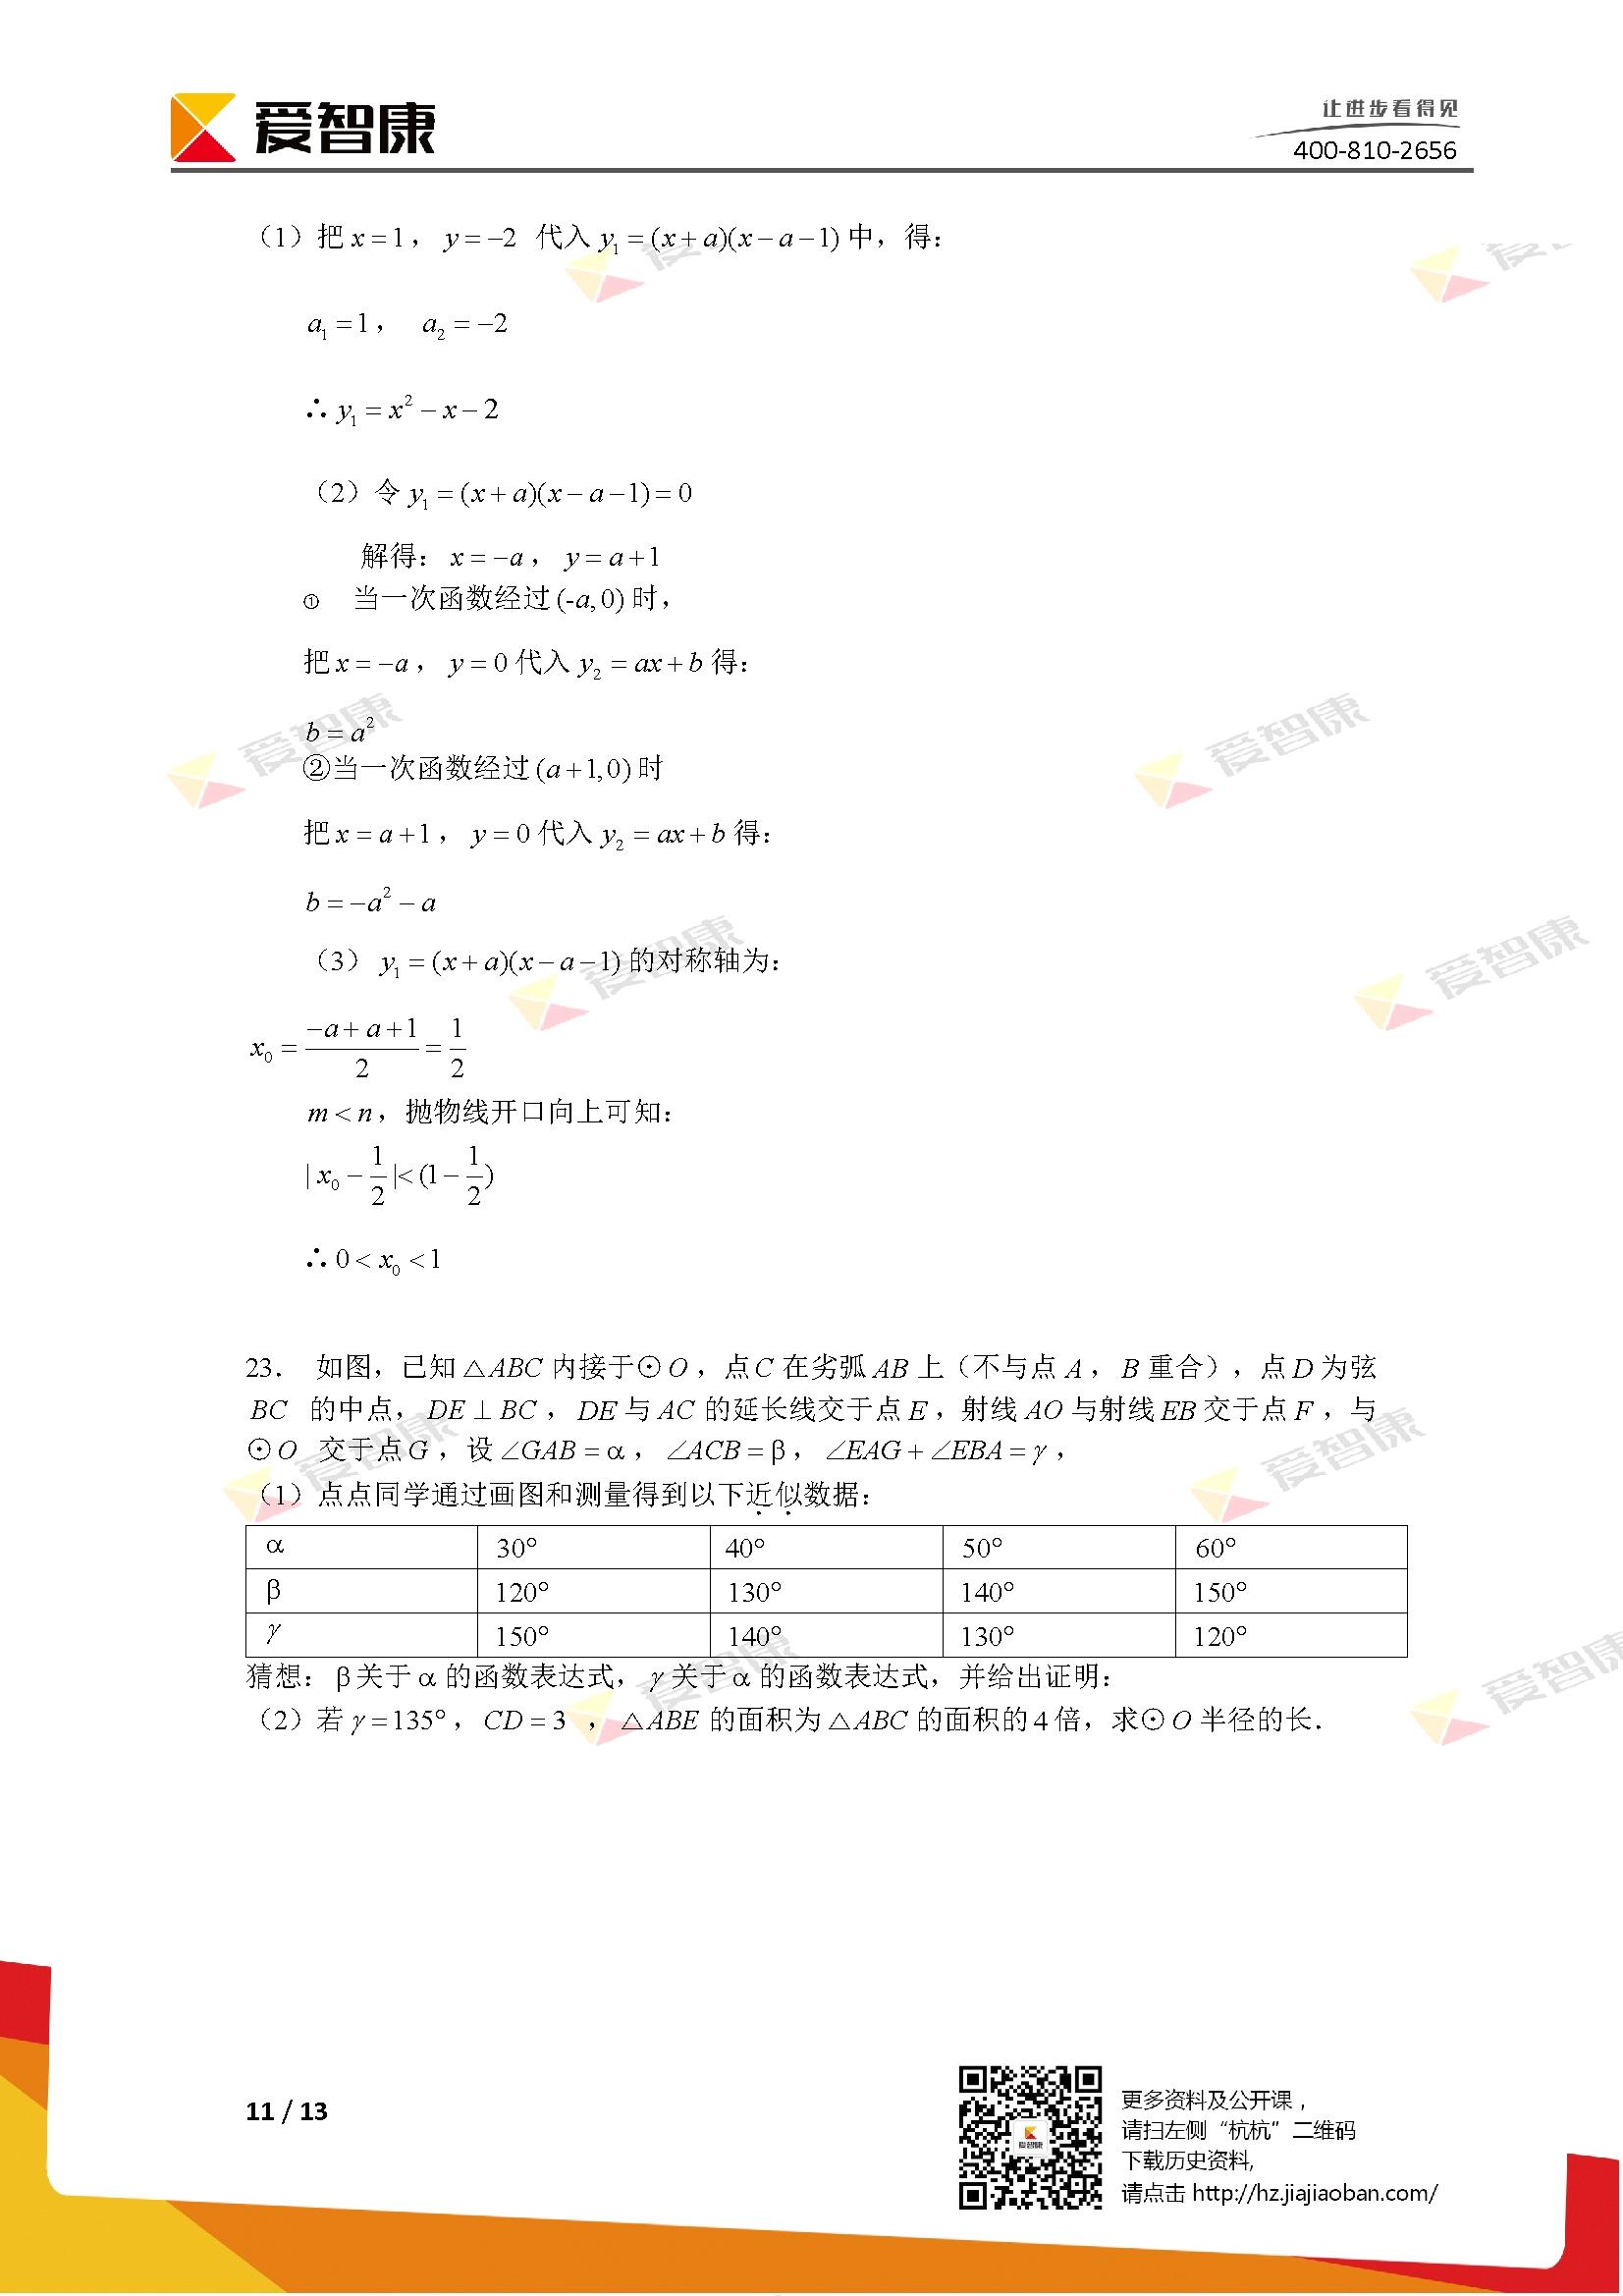 Microsoft Word - 2017年杭州市中考数学试卷解析211.jpg